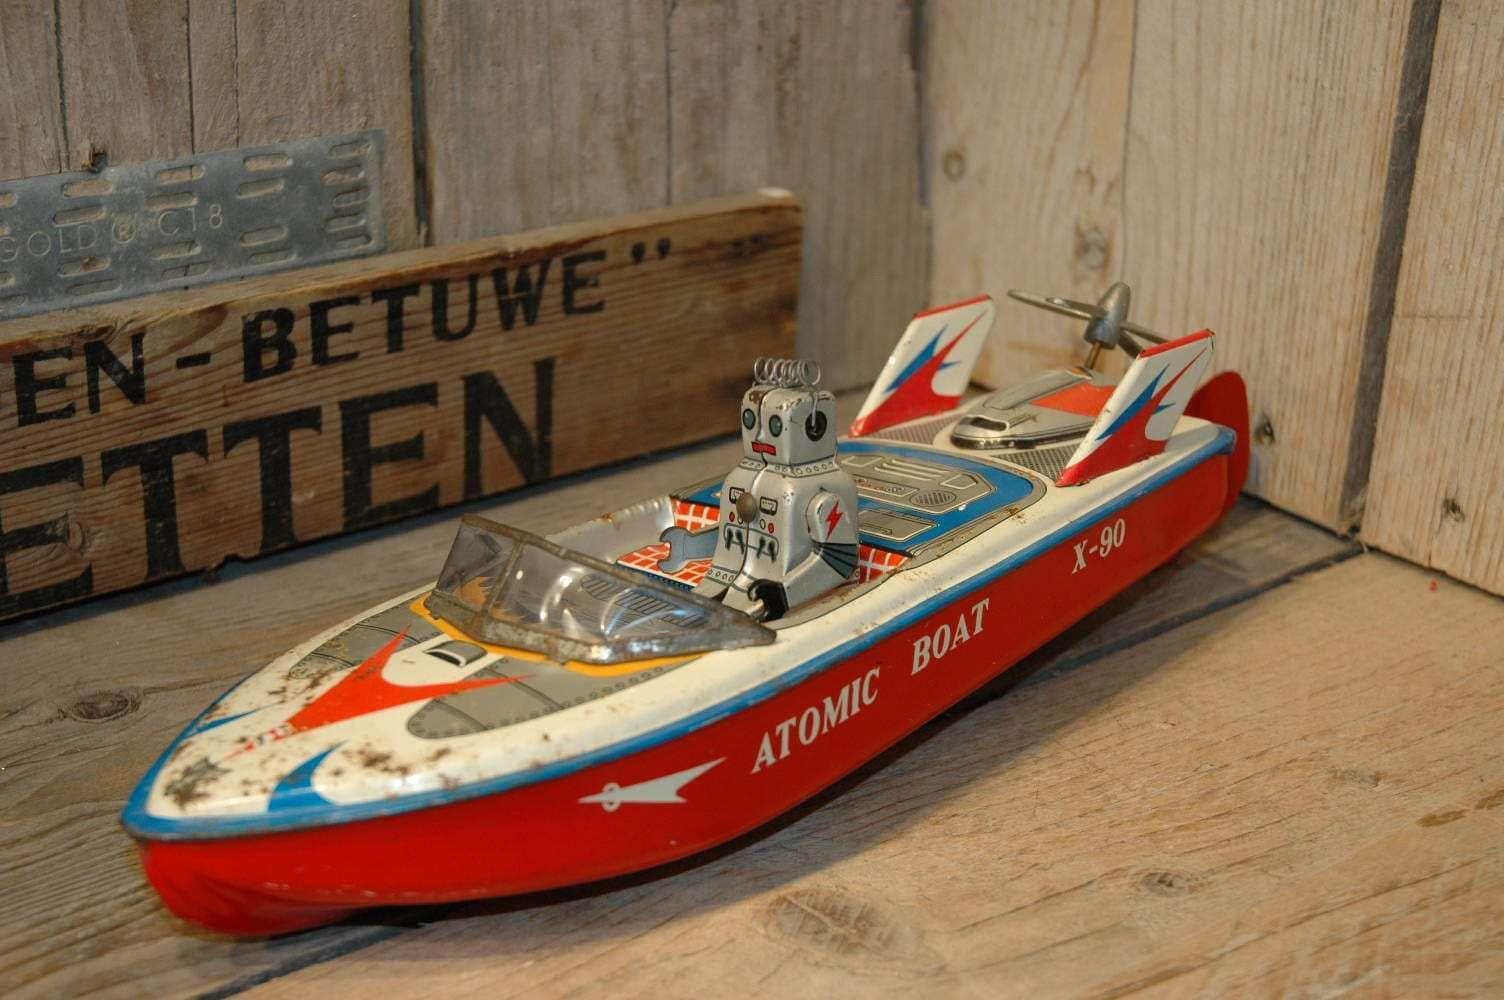 ET - Atomic Boat X-90